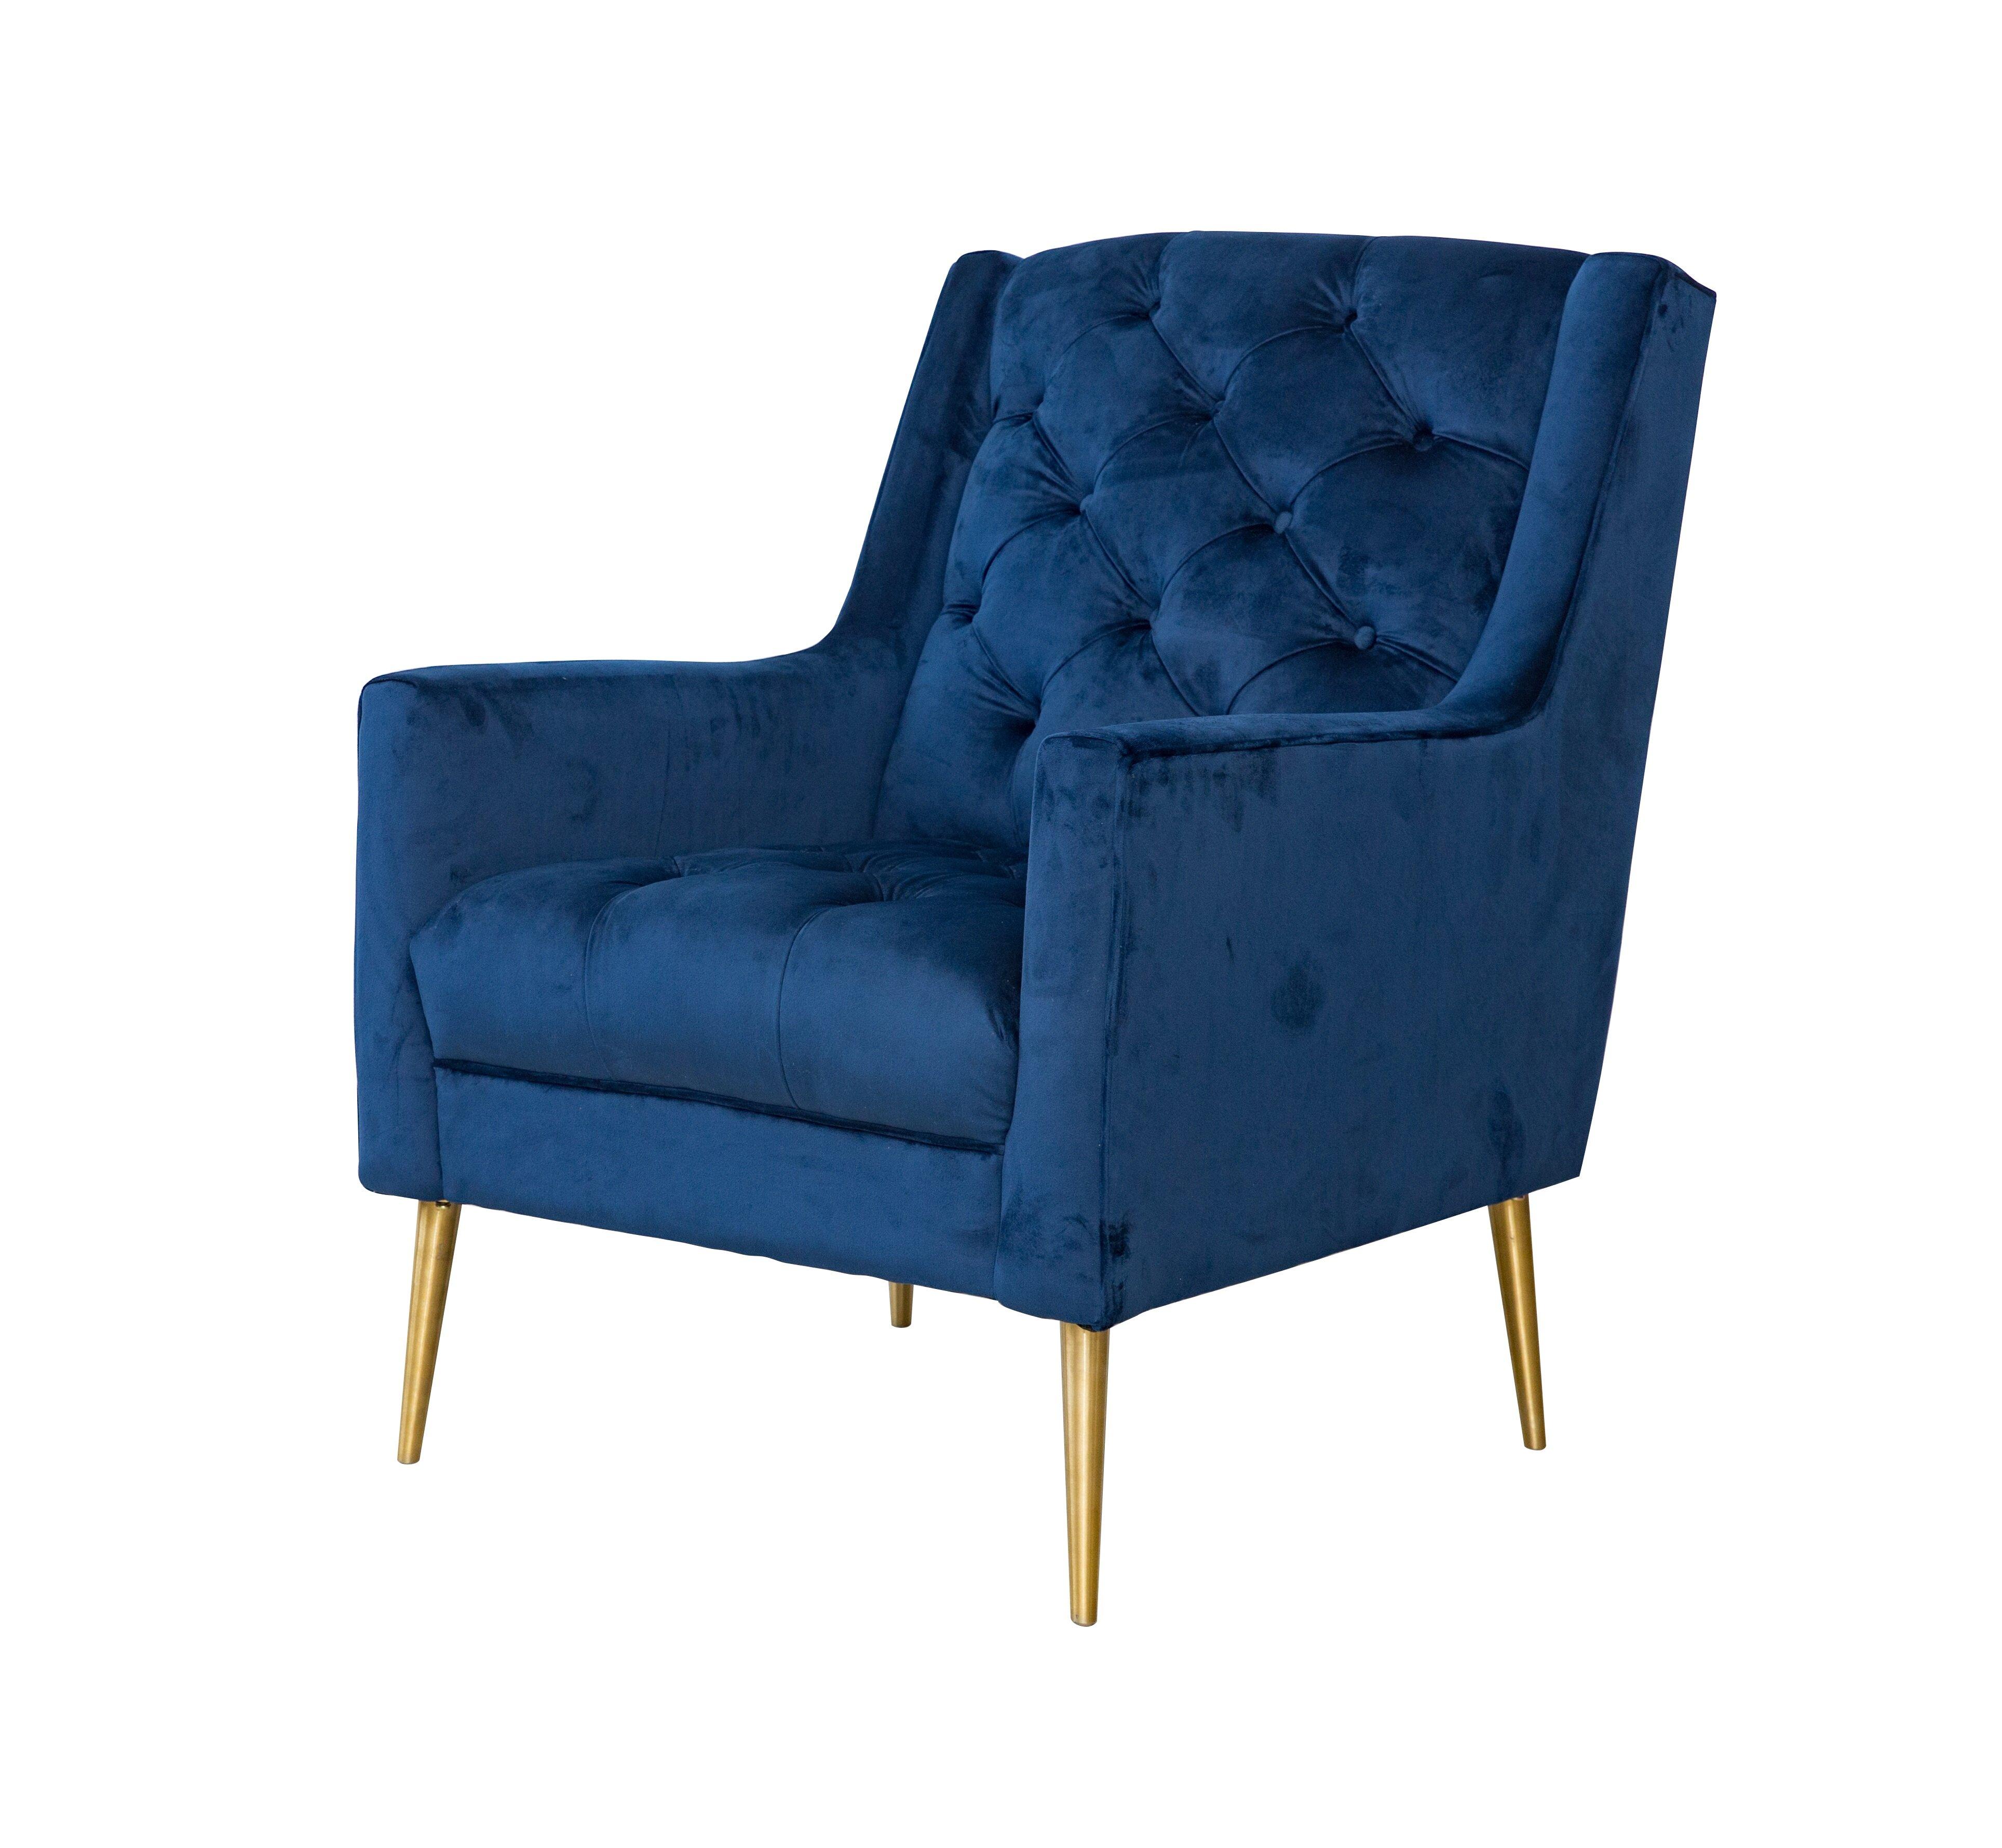 mercer41 delvale tufted wingback chair wayfair - Tufted Wingback Chair